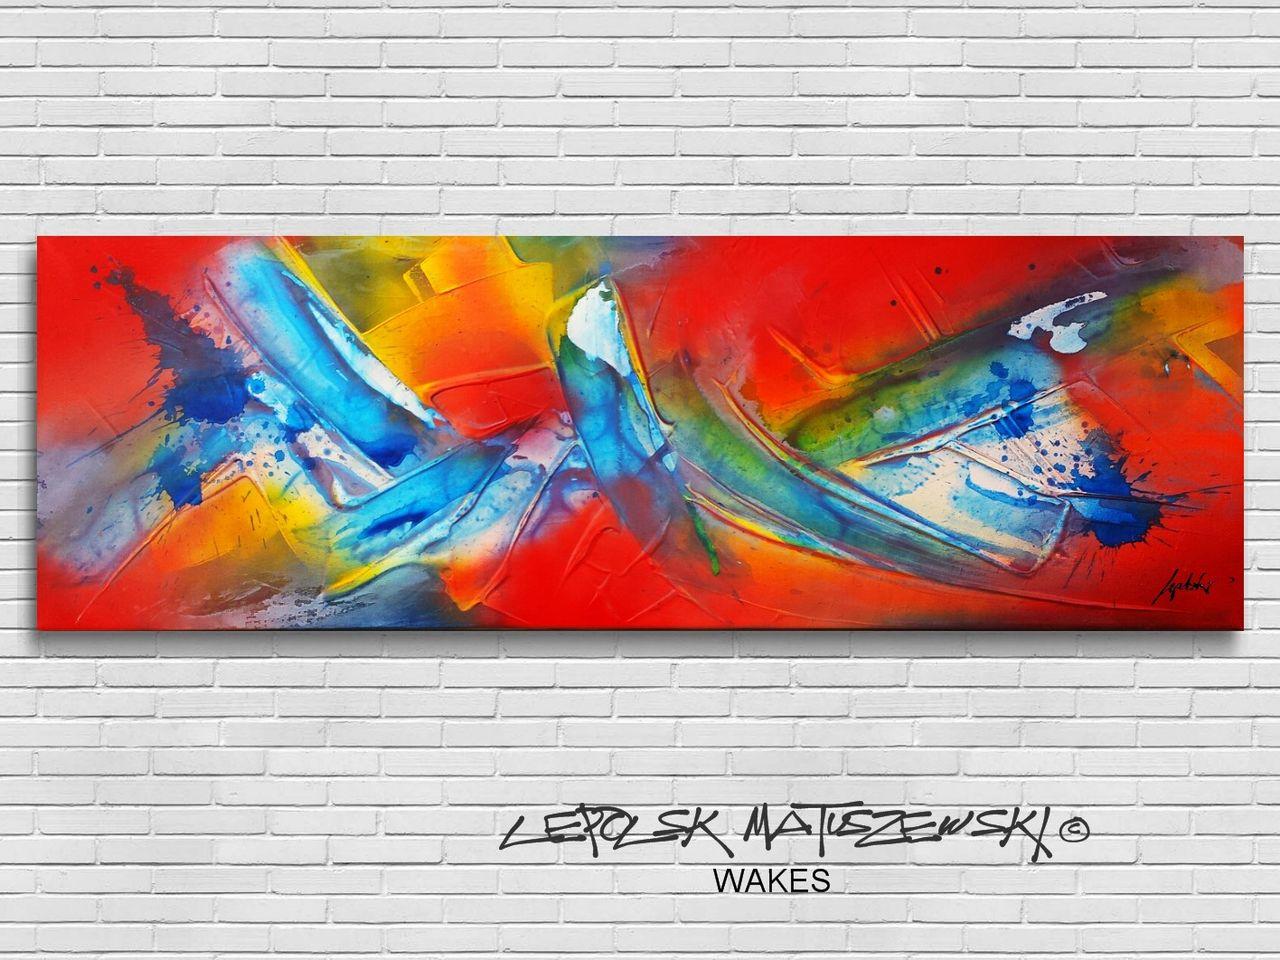 LEPOLSK MATUSZEWSKI WAKES lepolsk 2016 abstract art graffiti